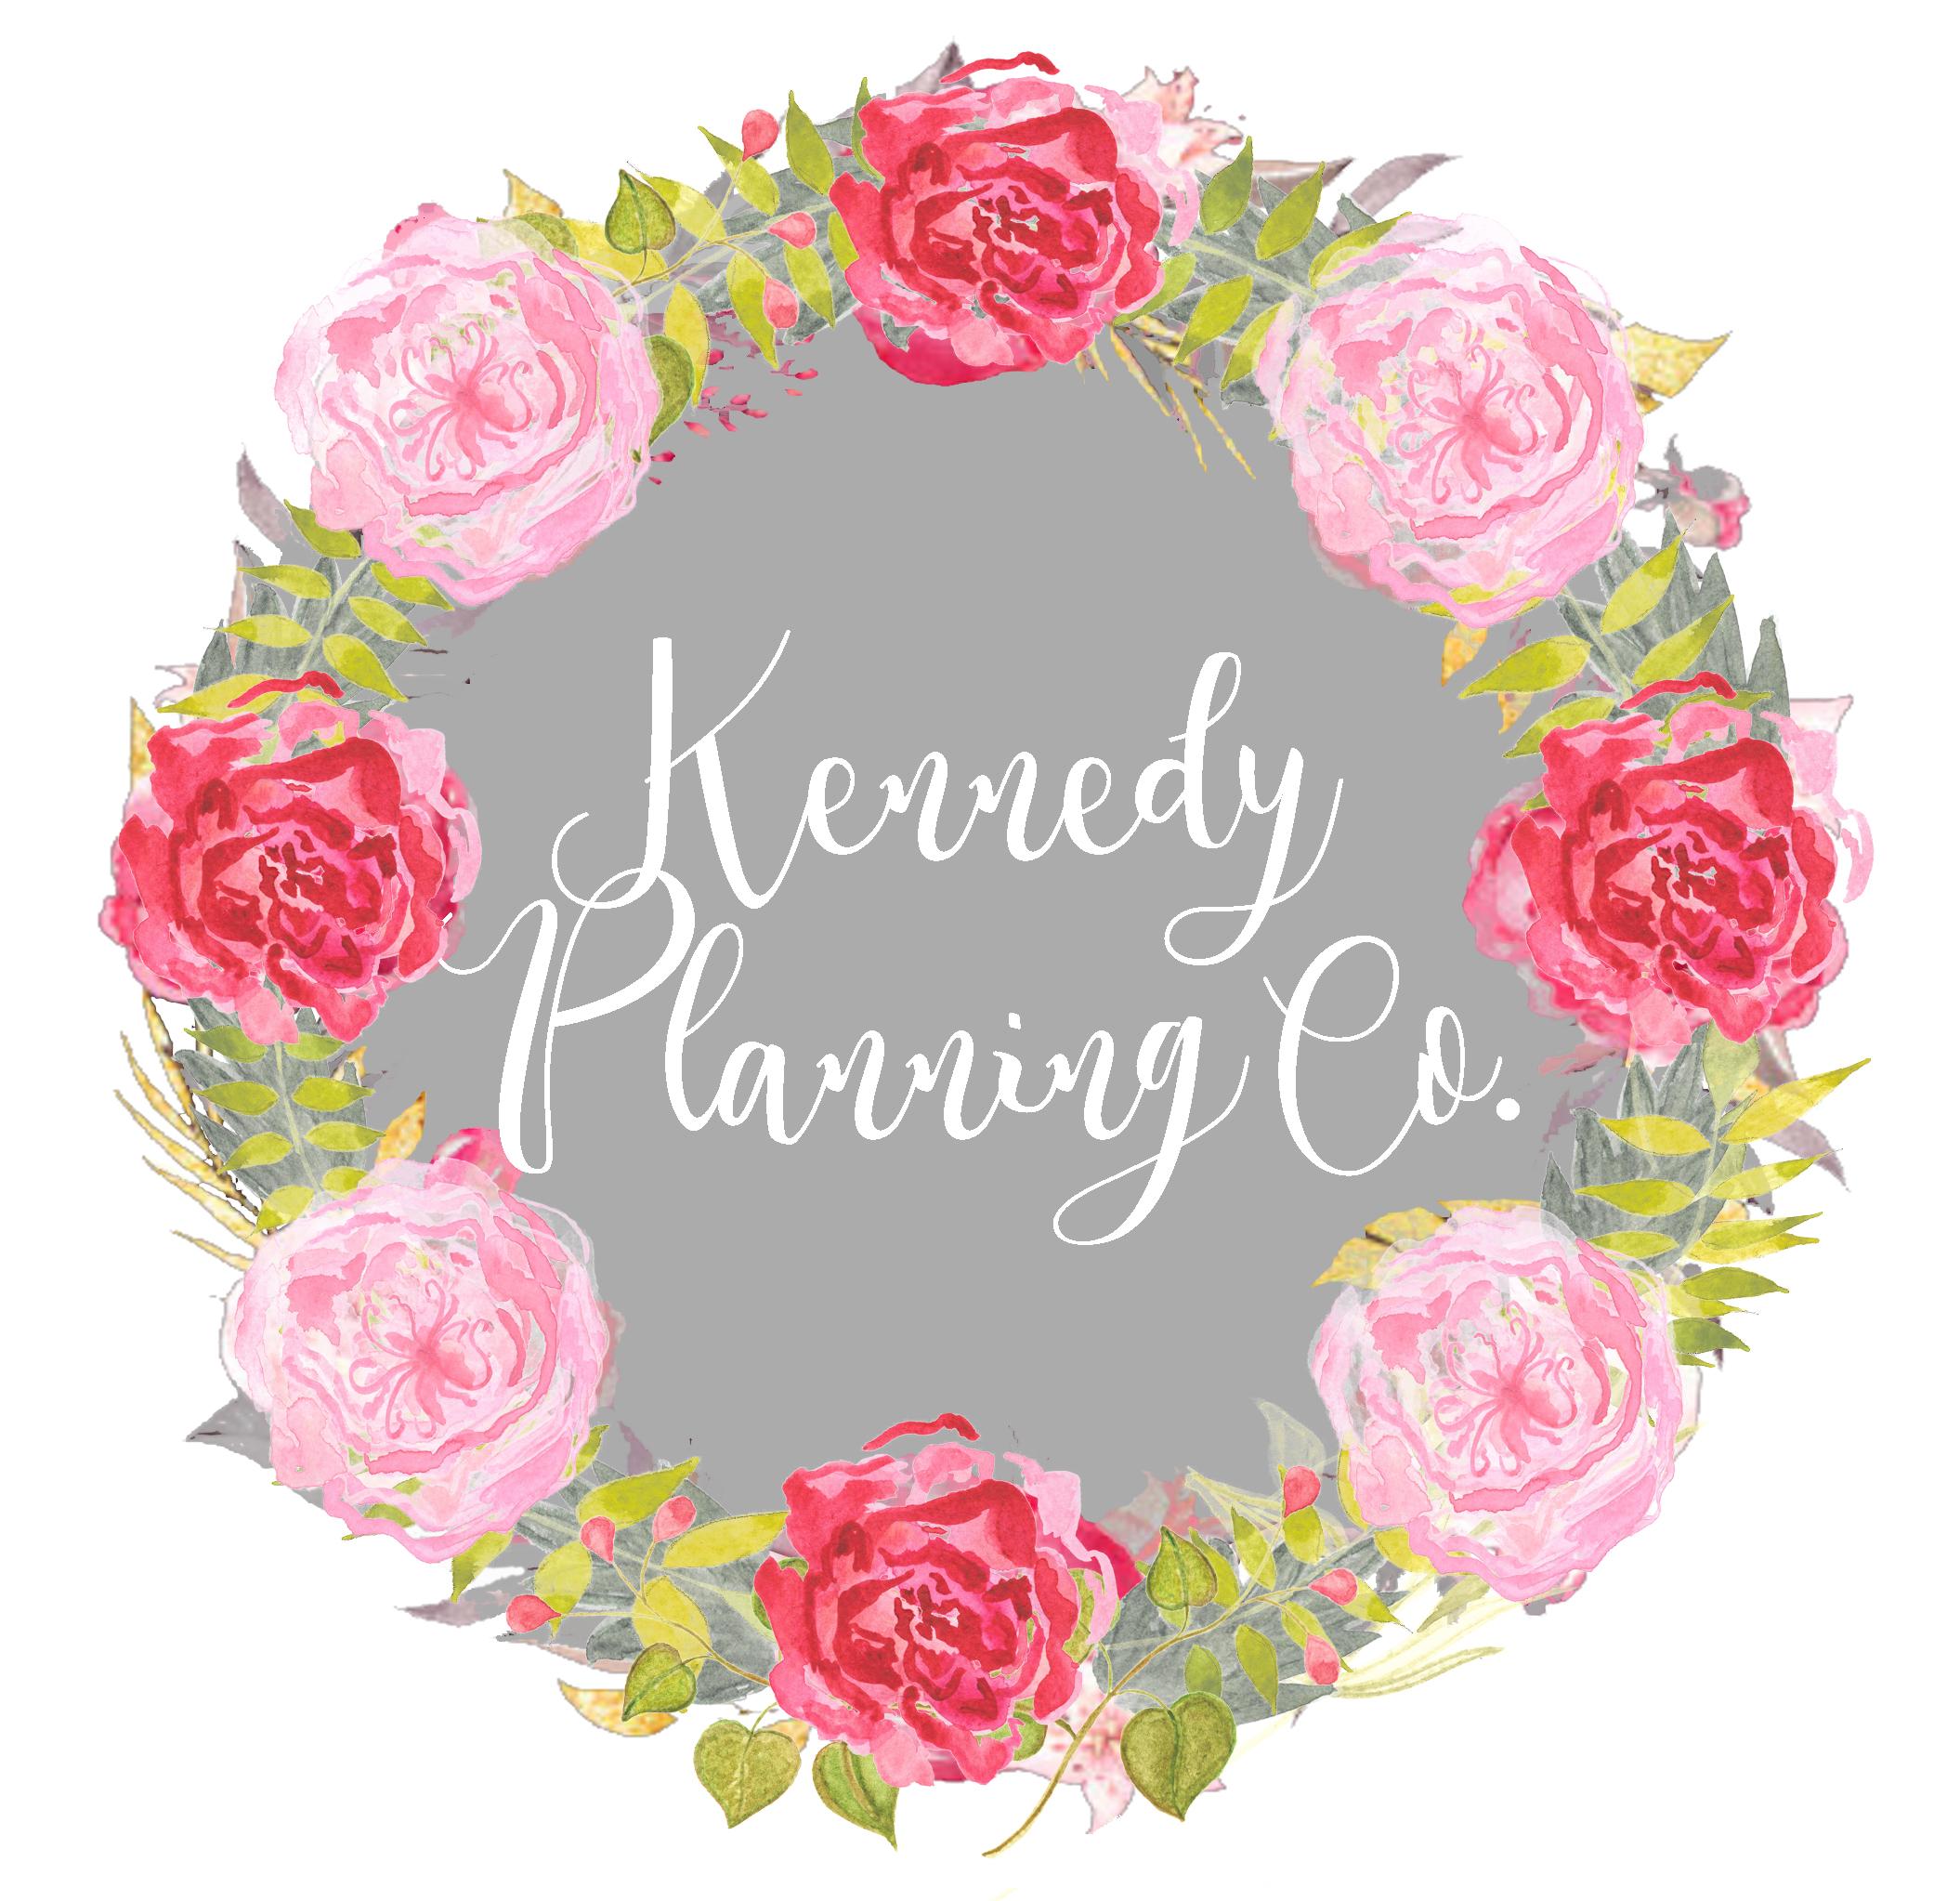 Kennedy Planning Company